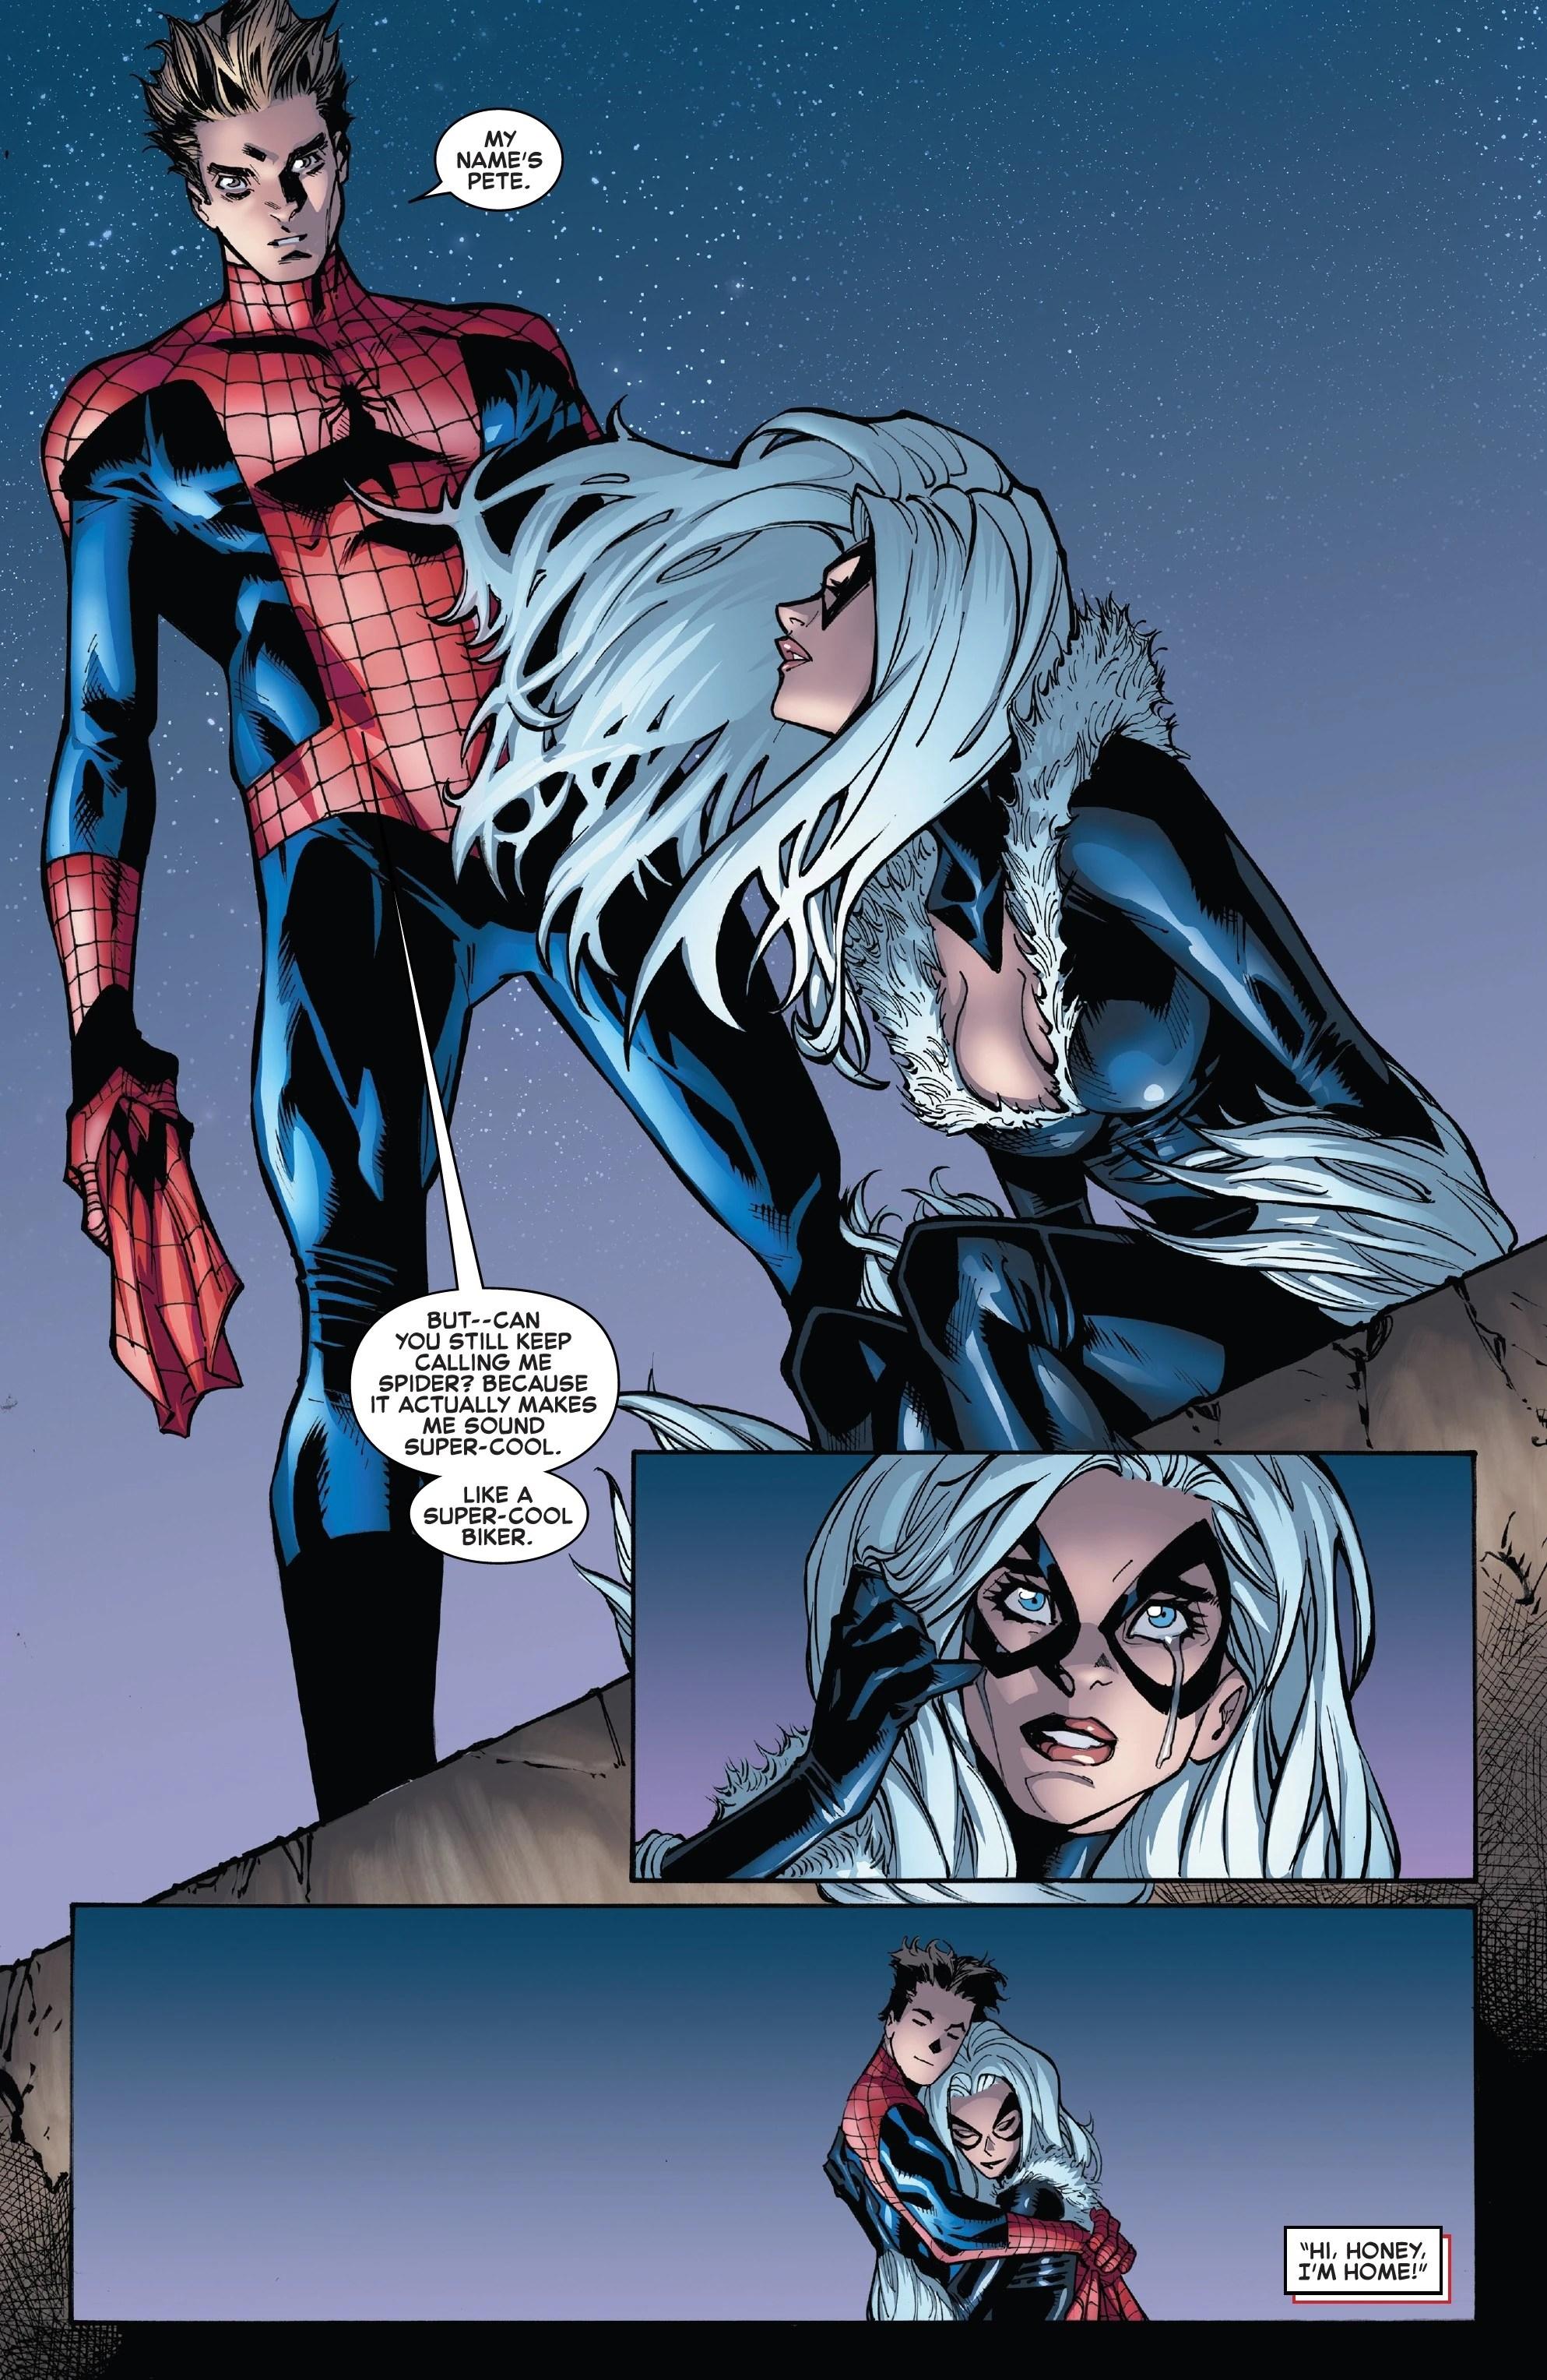 Spiderman And Blackcat Fanfiction : spiderman, blackcat, fanfiction, Felicia, Hardy, (Earth-616), Marvel, Database, Fandom